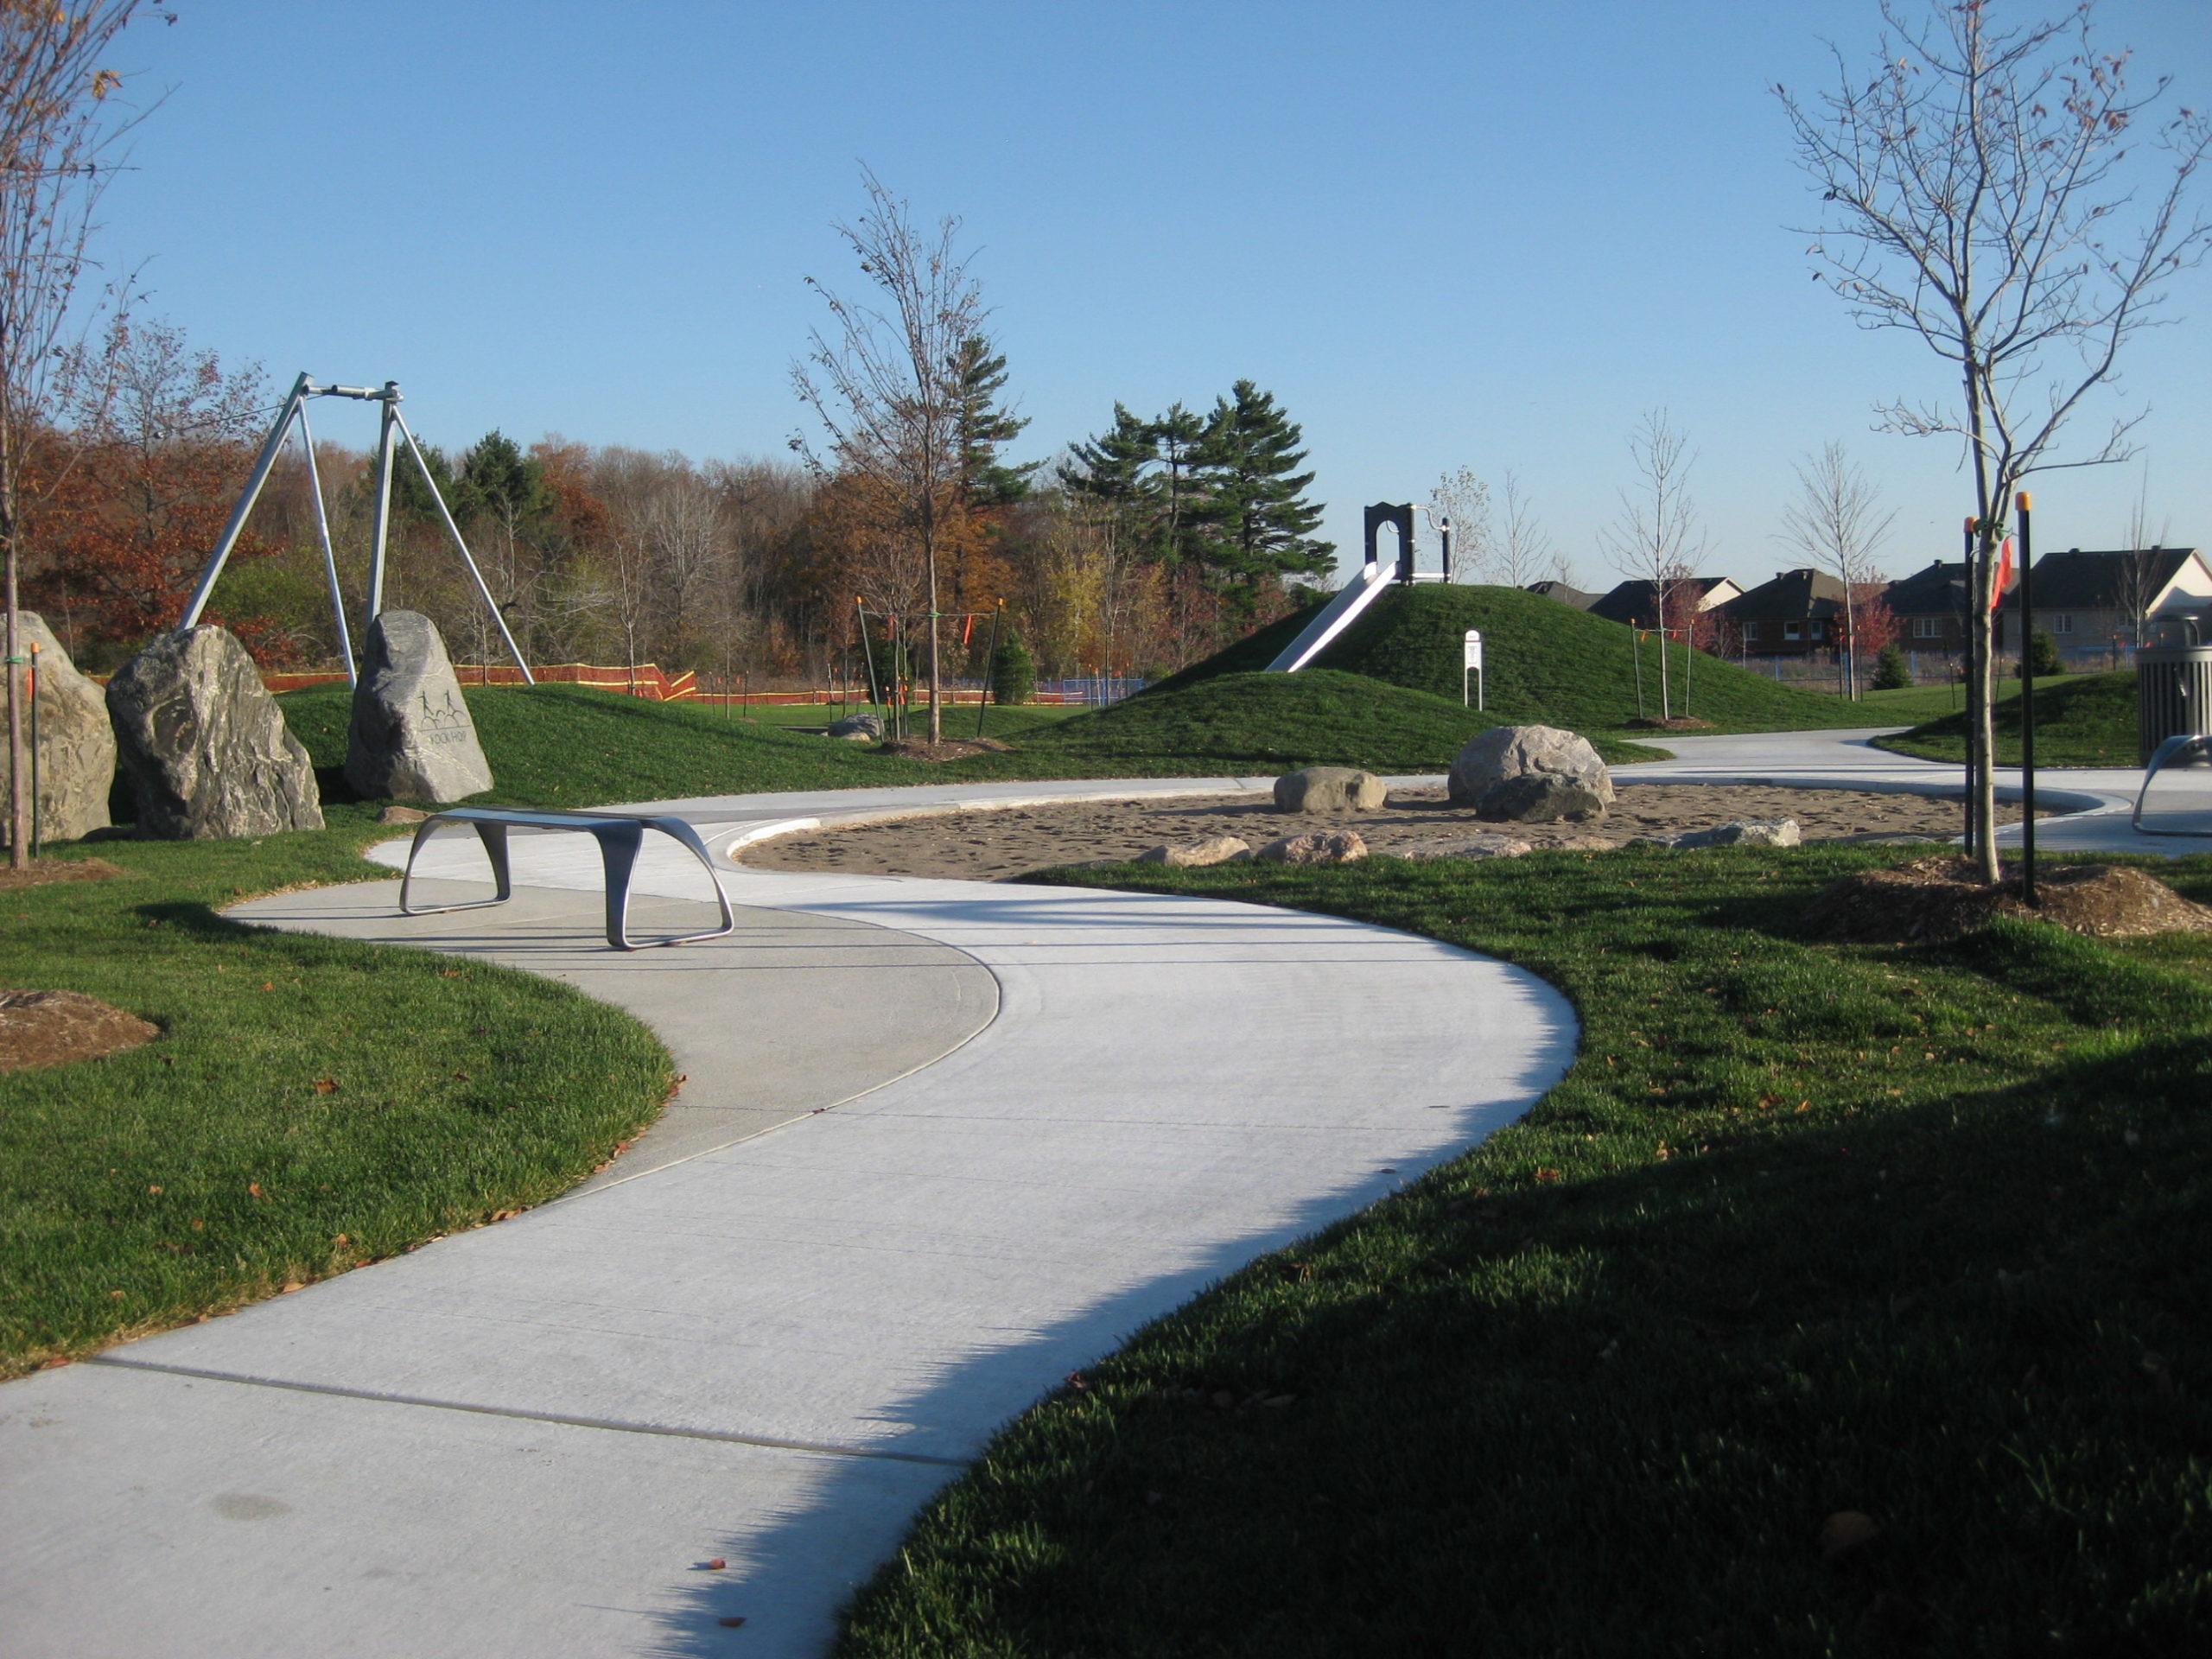 Pathway through park.